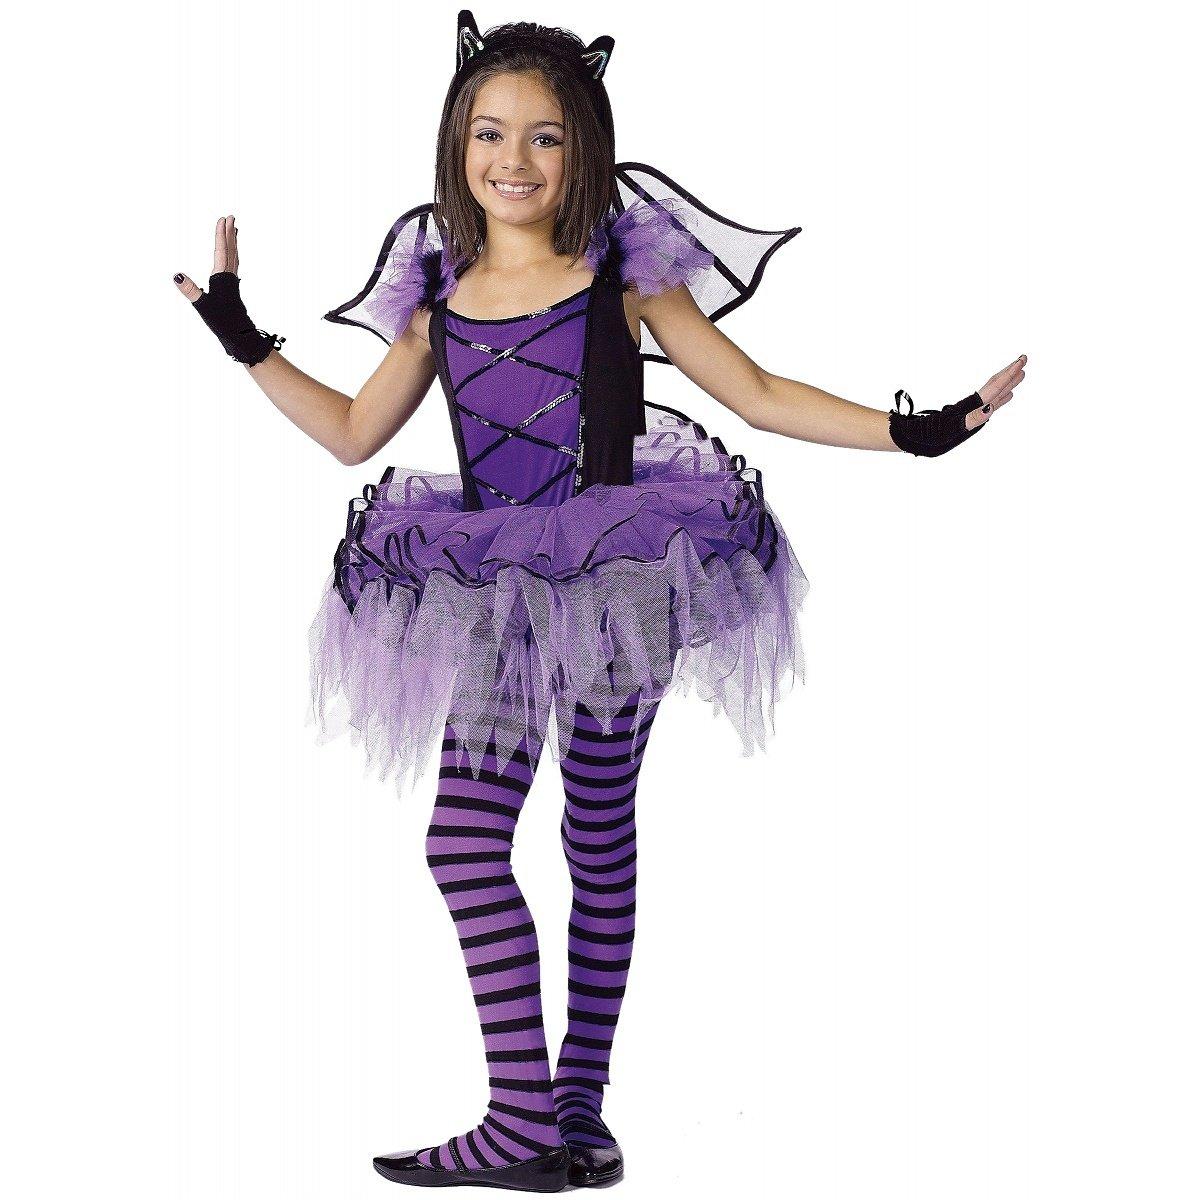 3cfa6b855 Amazon.com  Batarina Child Costume - Large  Toys   Games